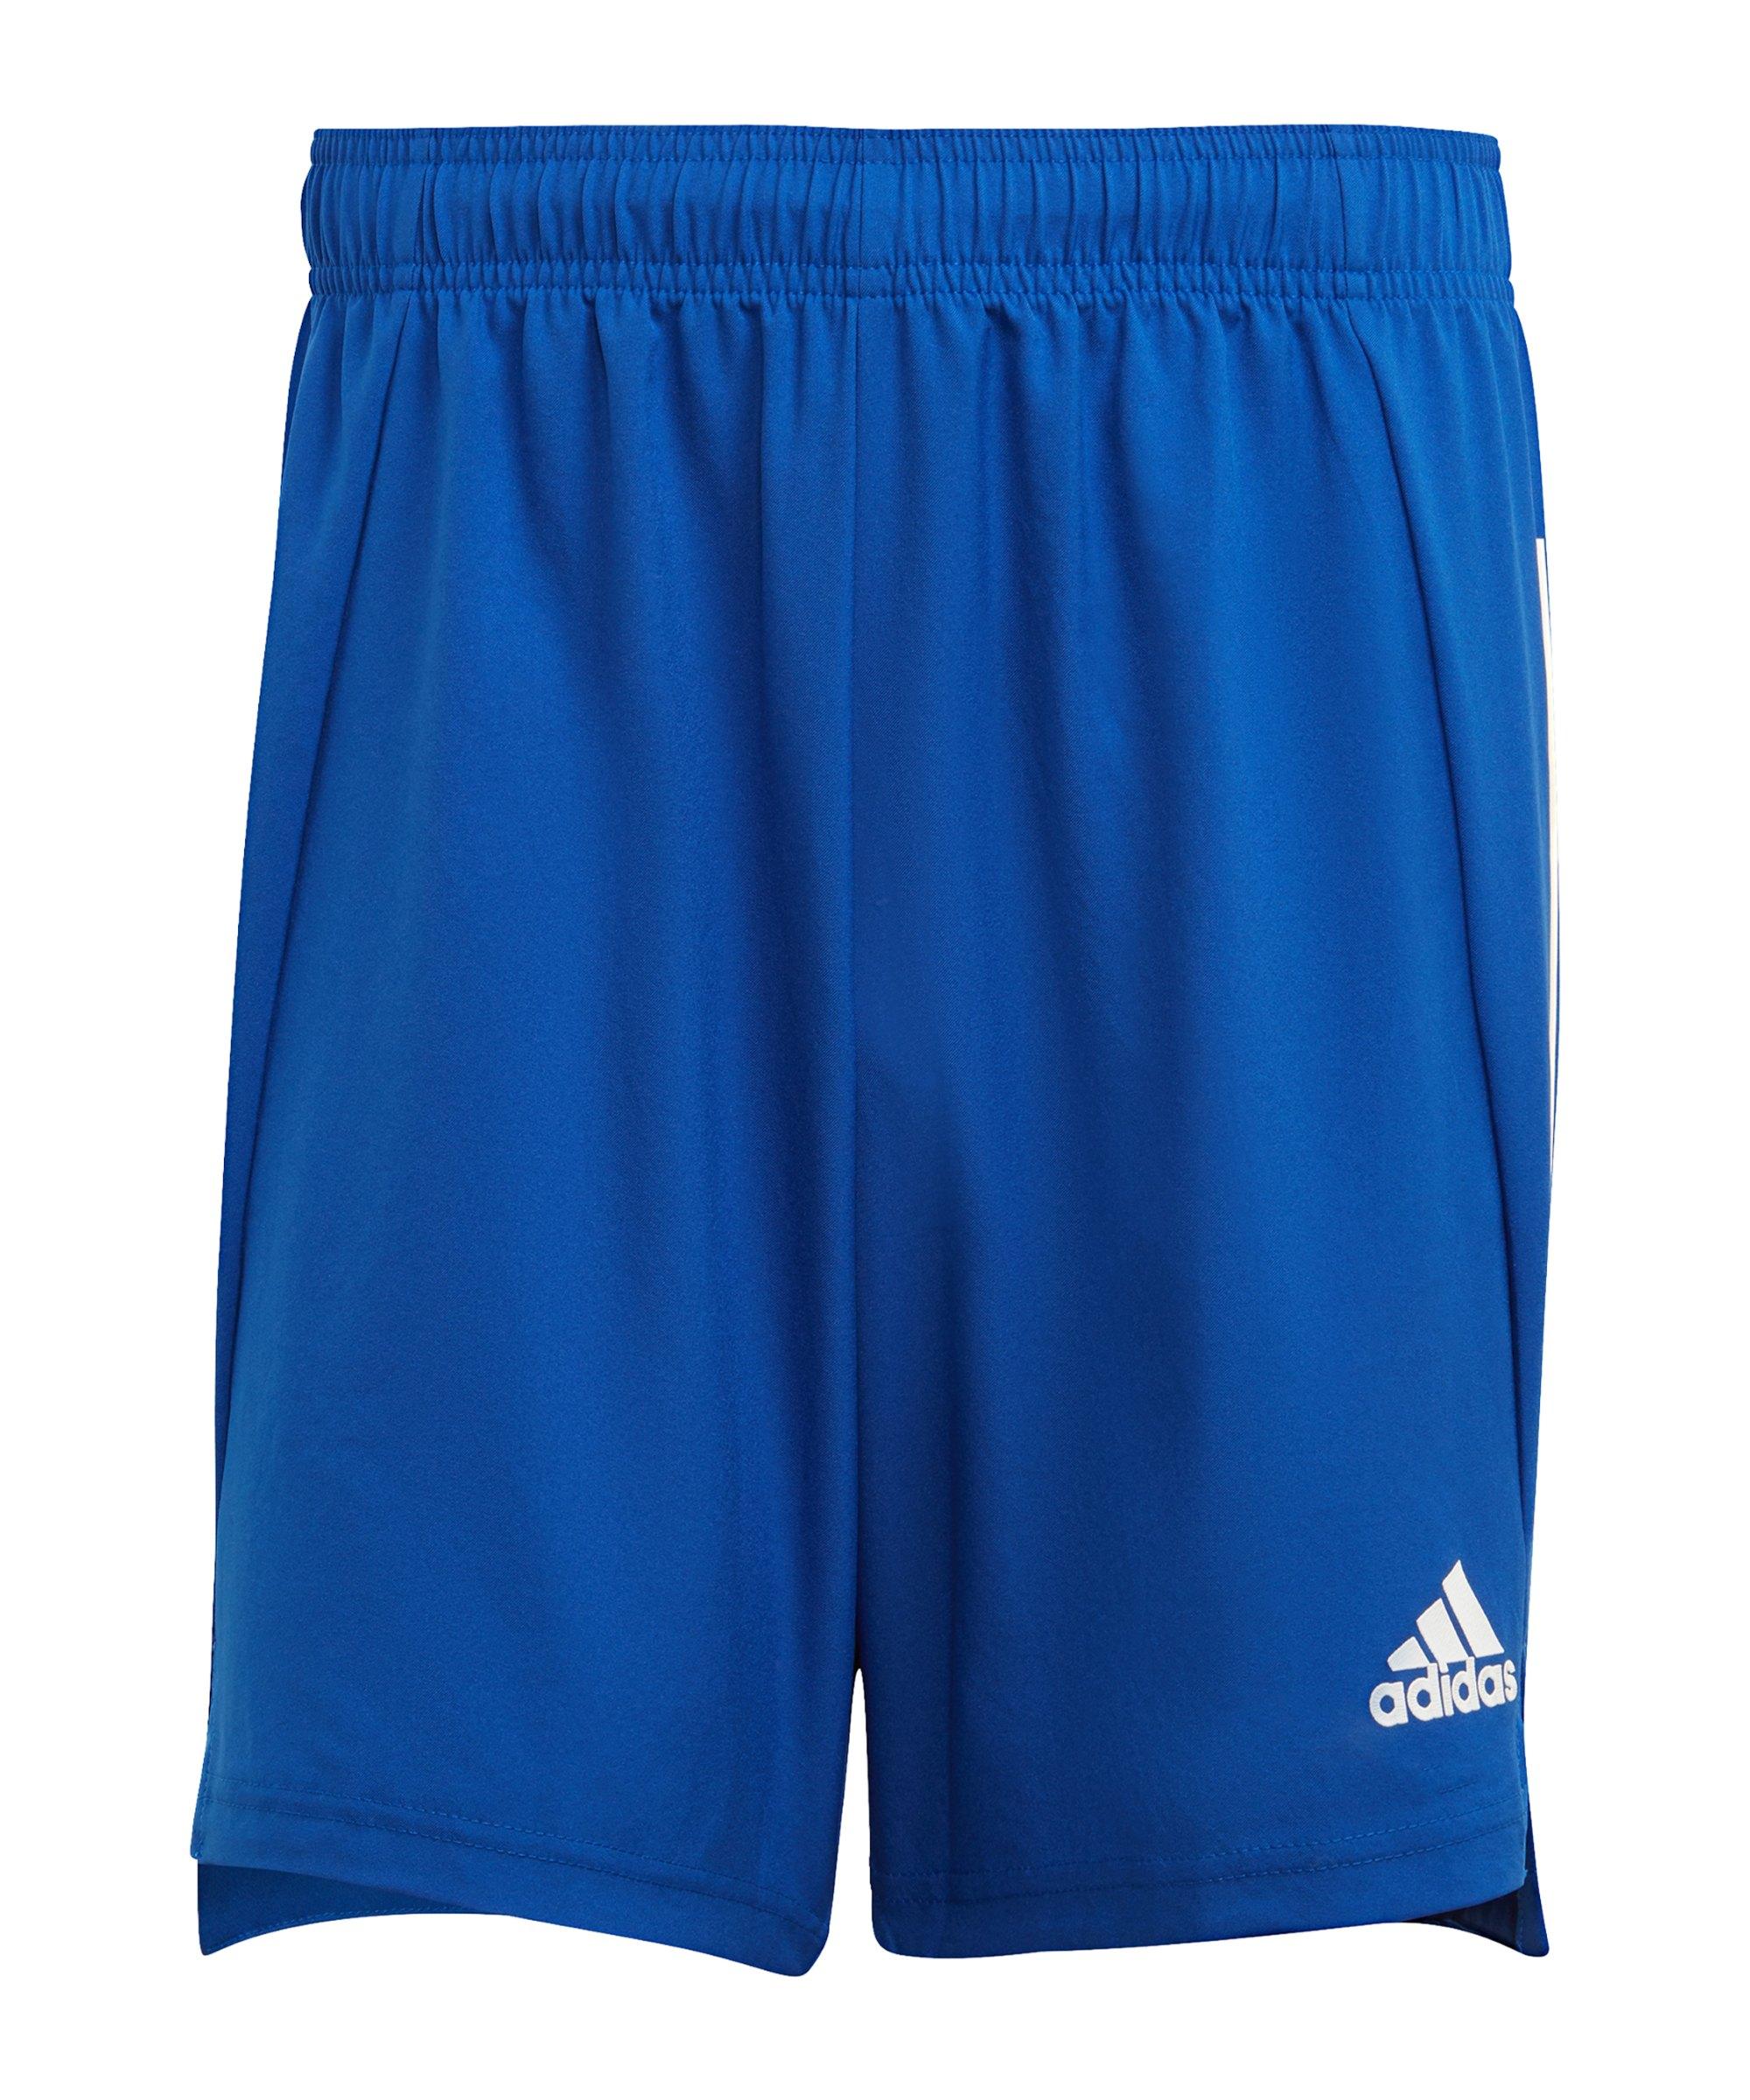 adidas Condivo 21 Short Blau Weiss - blau